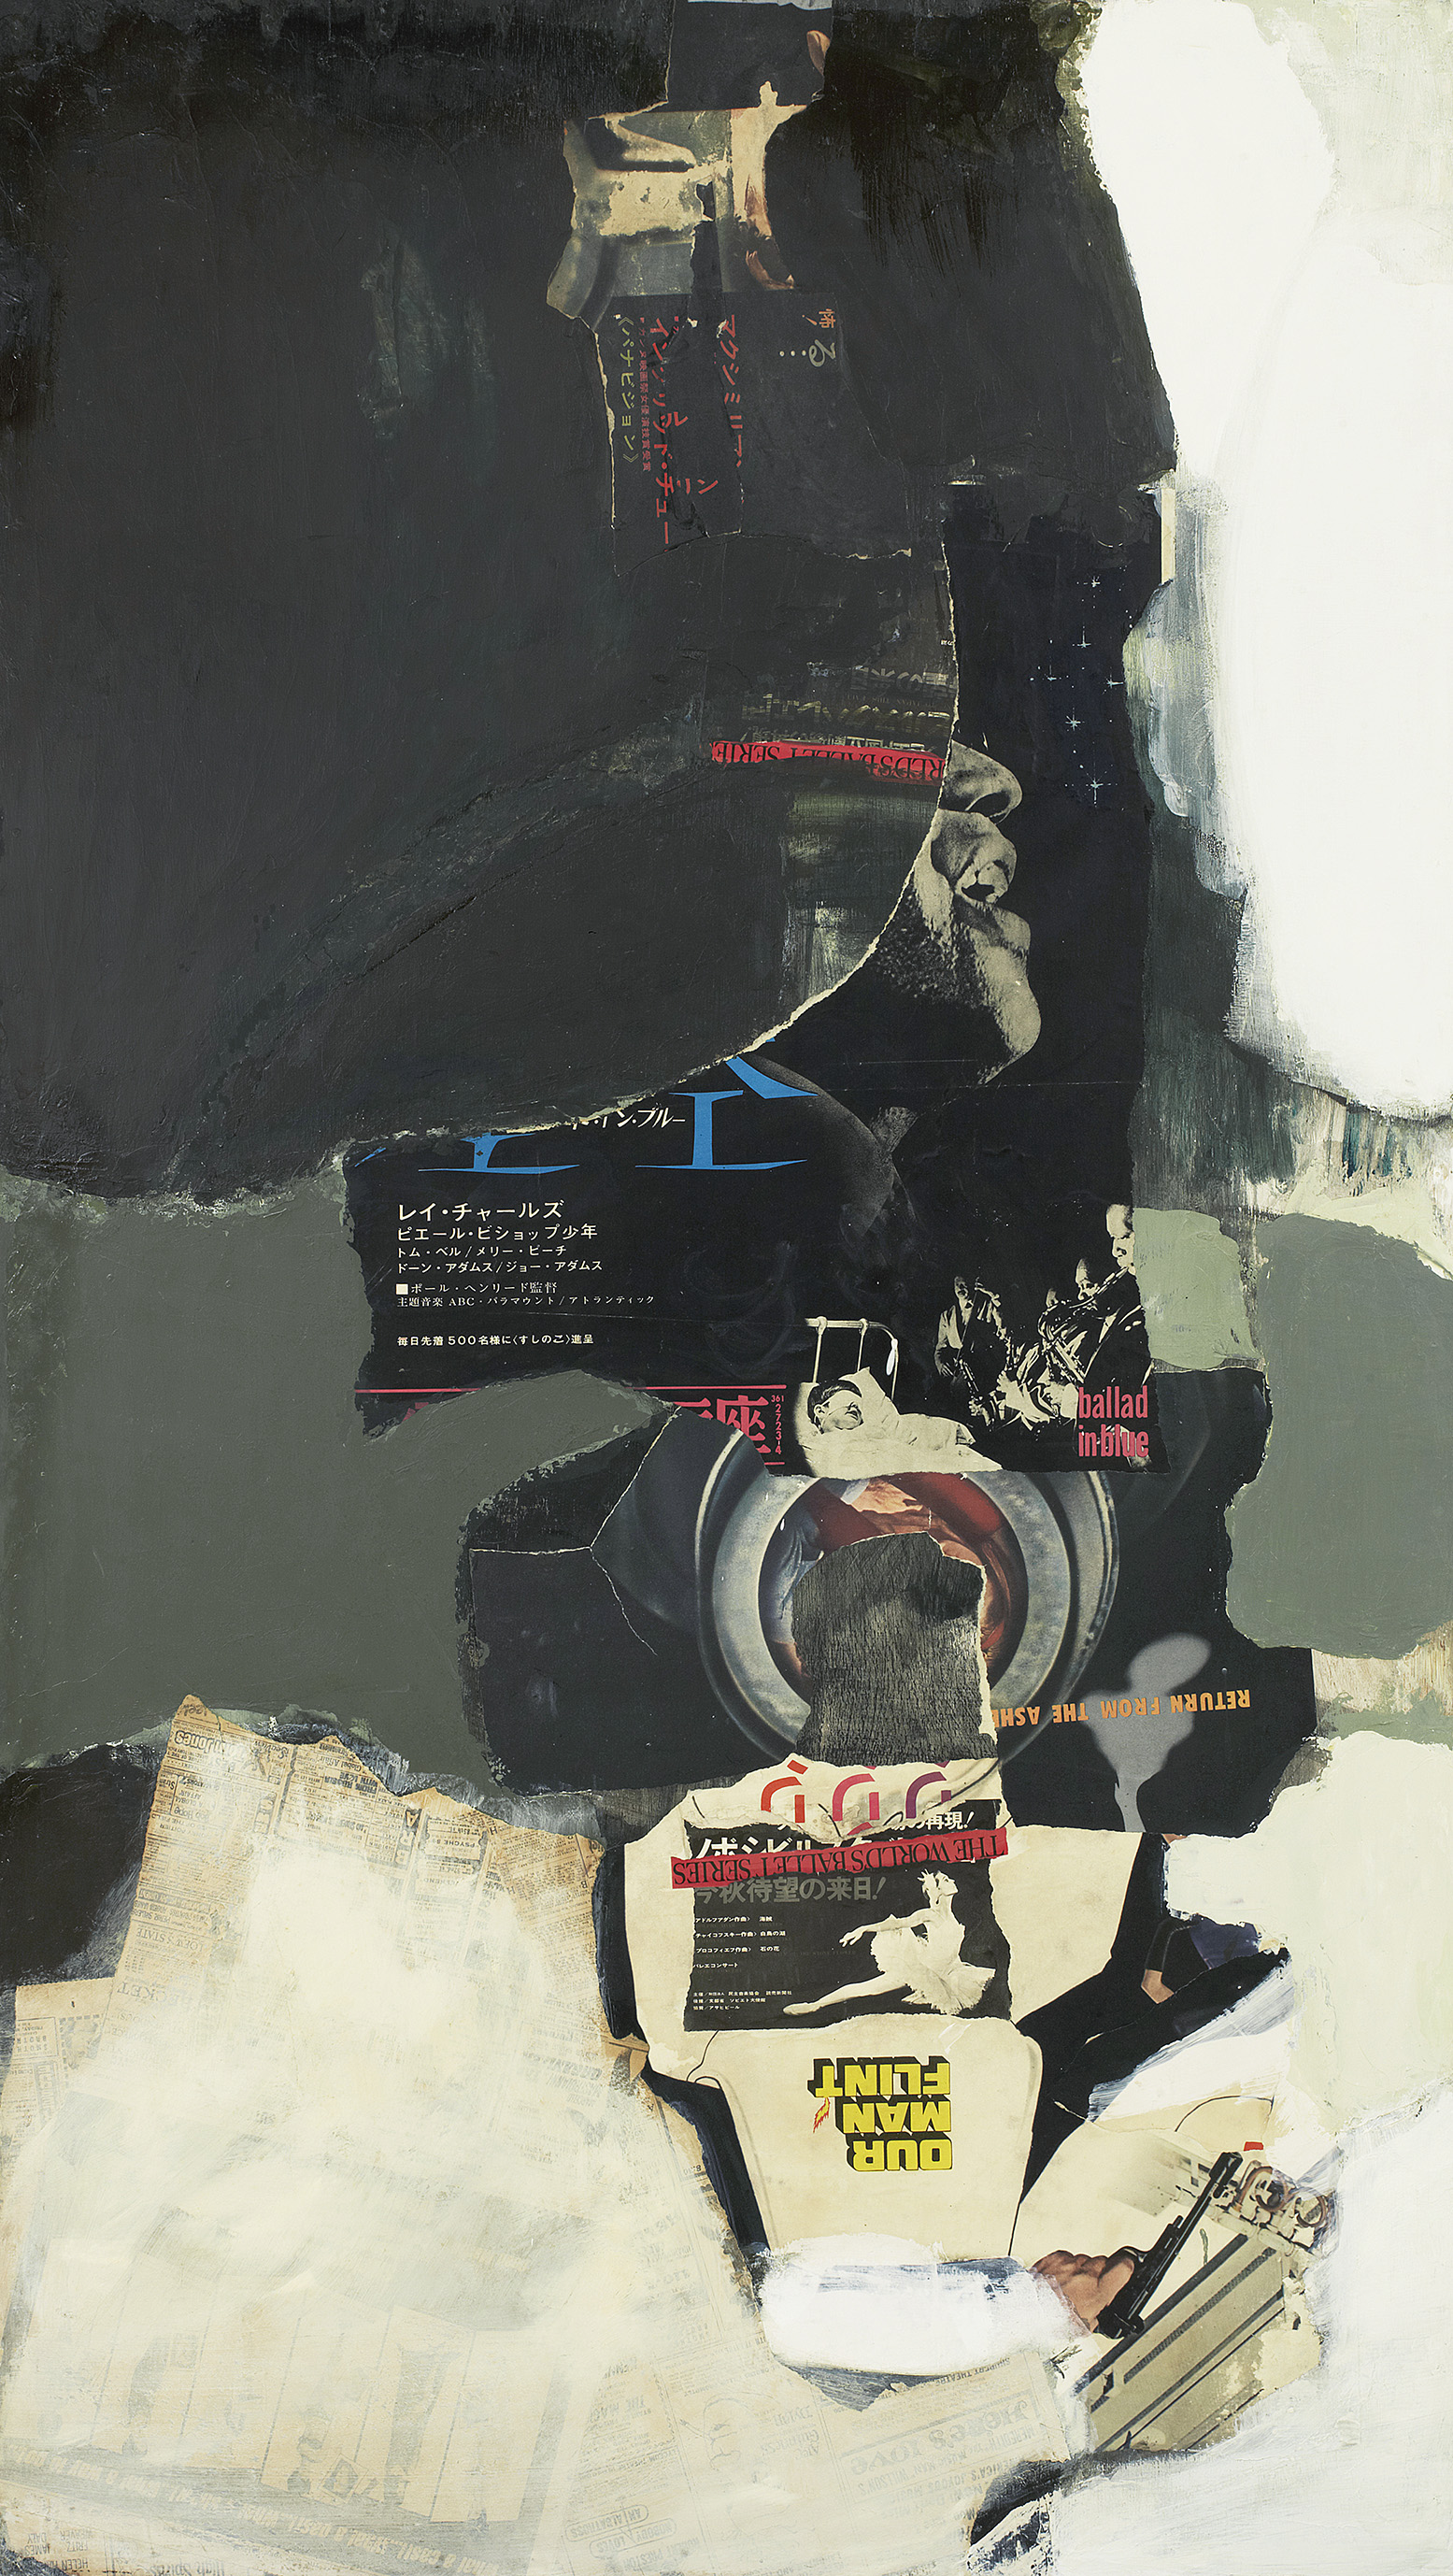 """Work 65-O"", 1965"